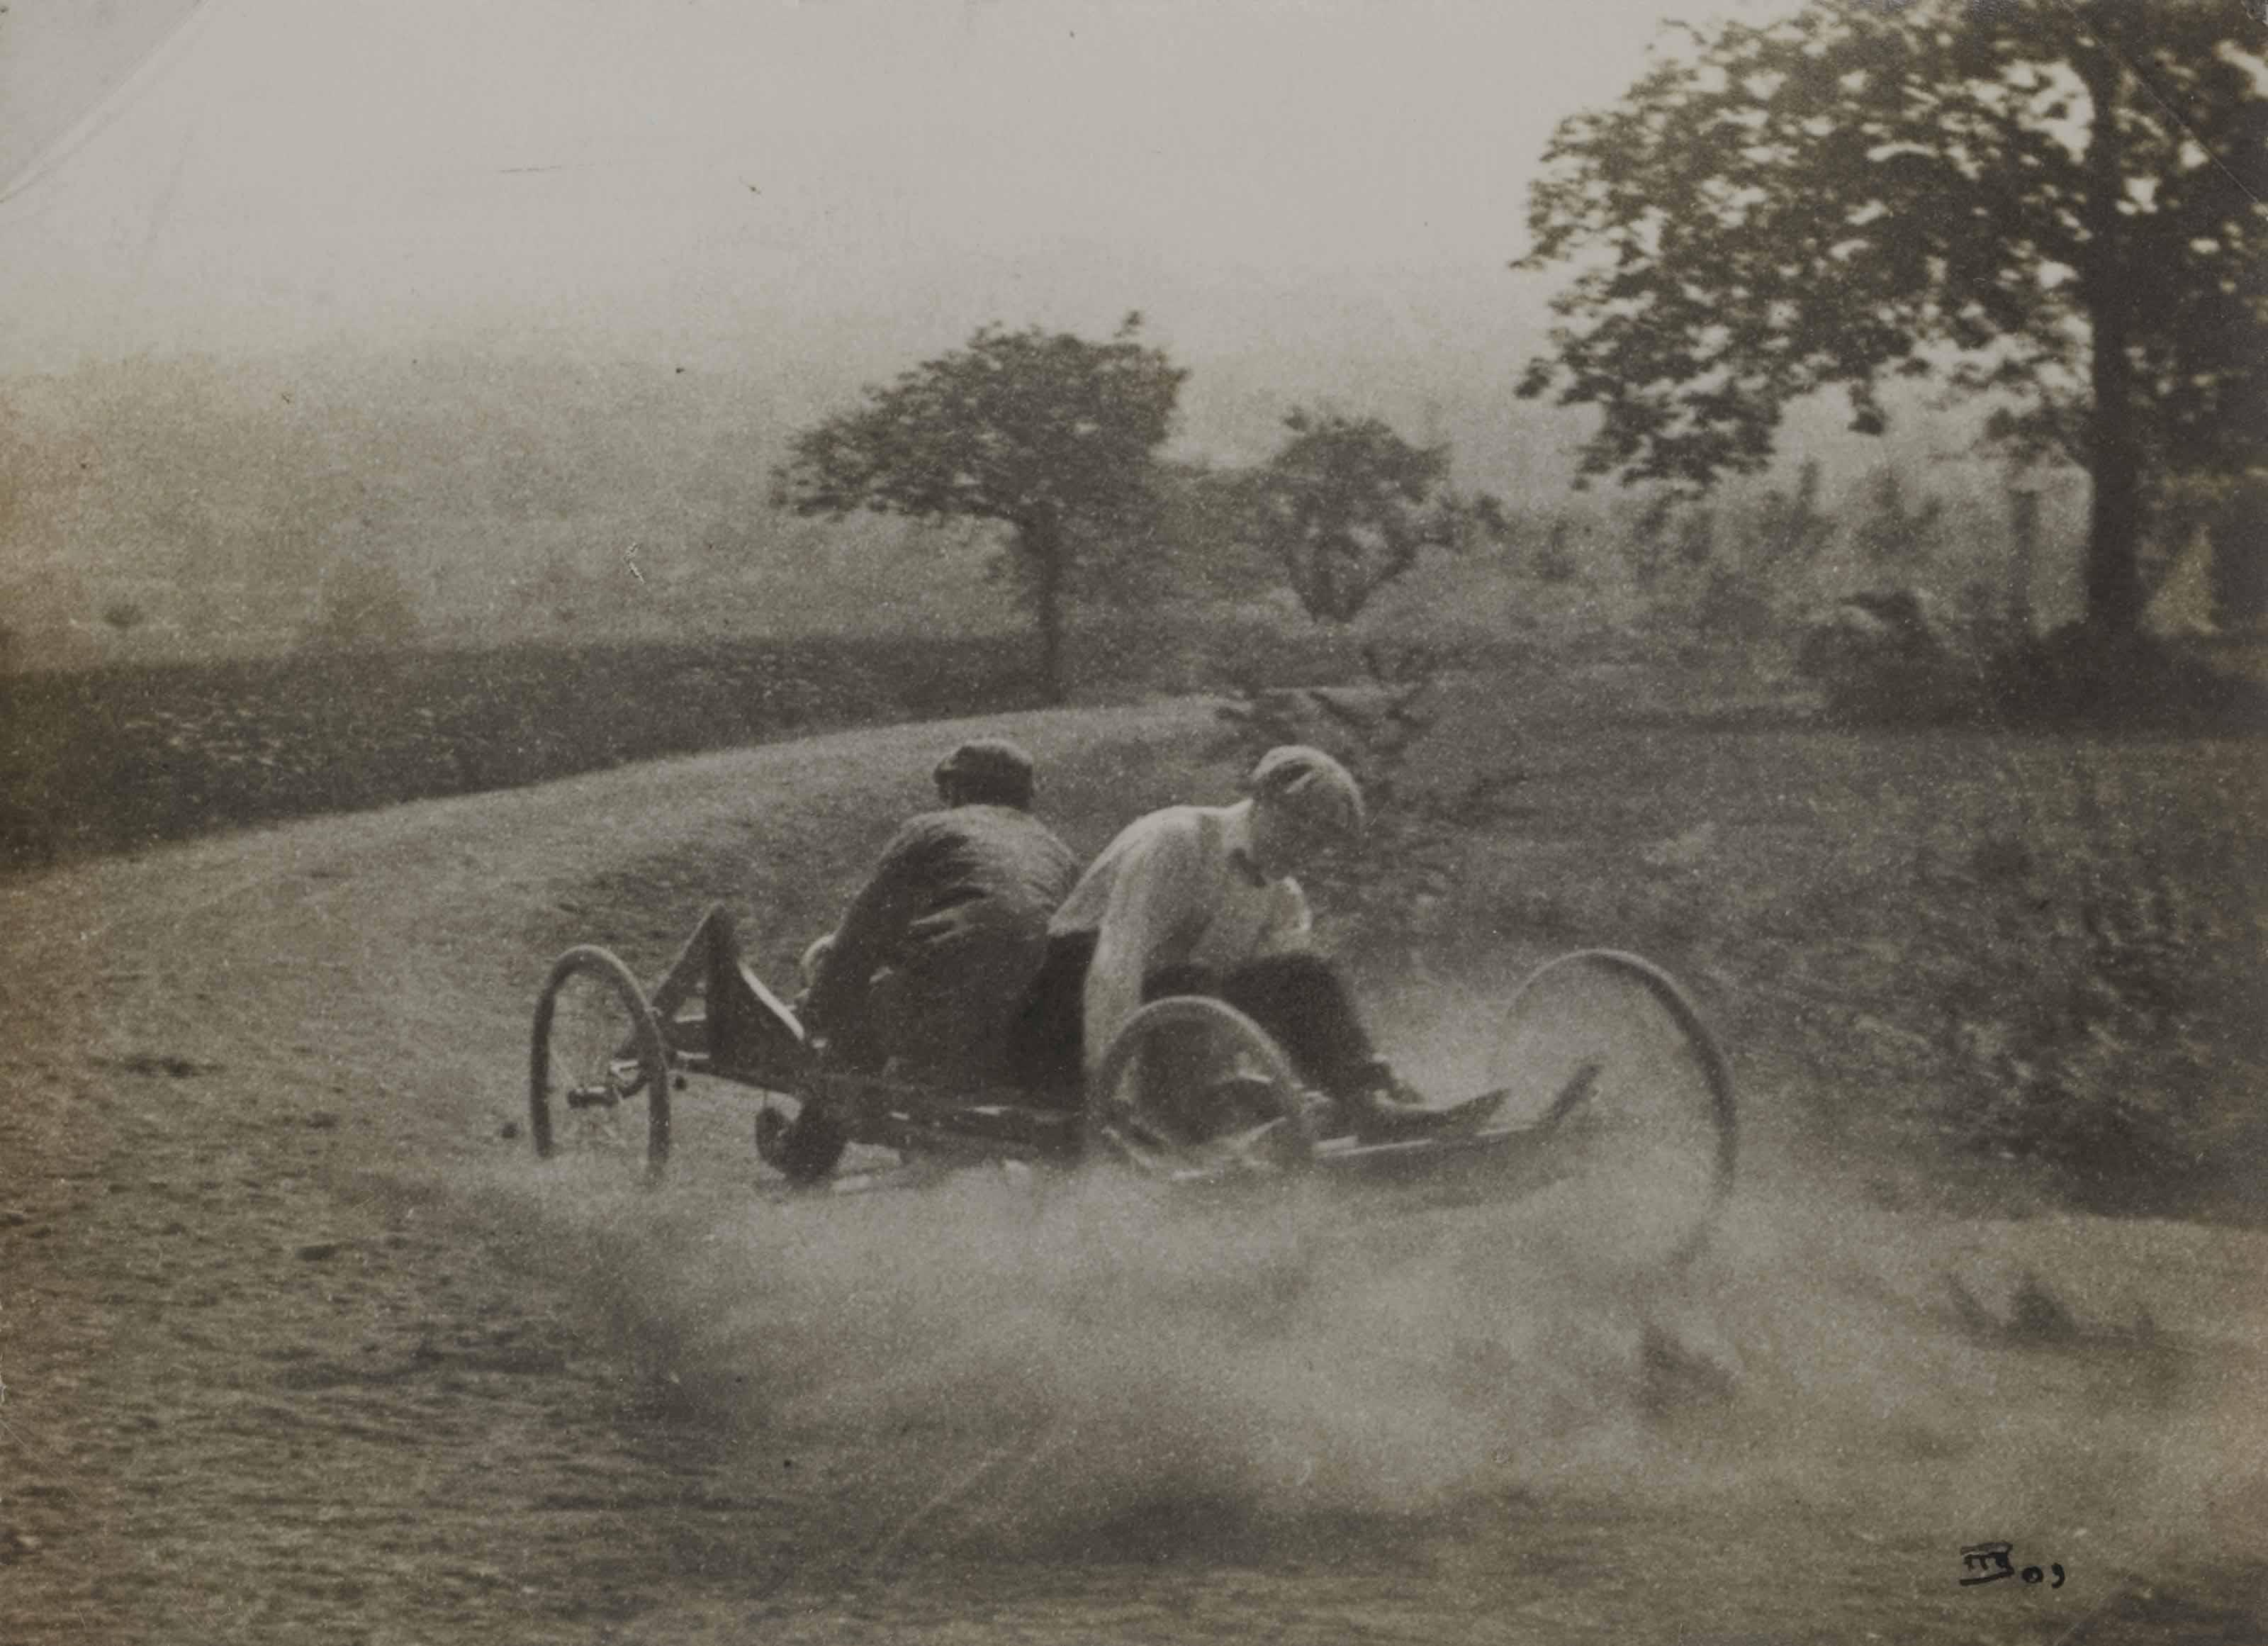 Go-cart run, Rouzat, été 1910